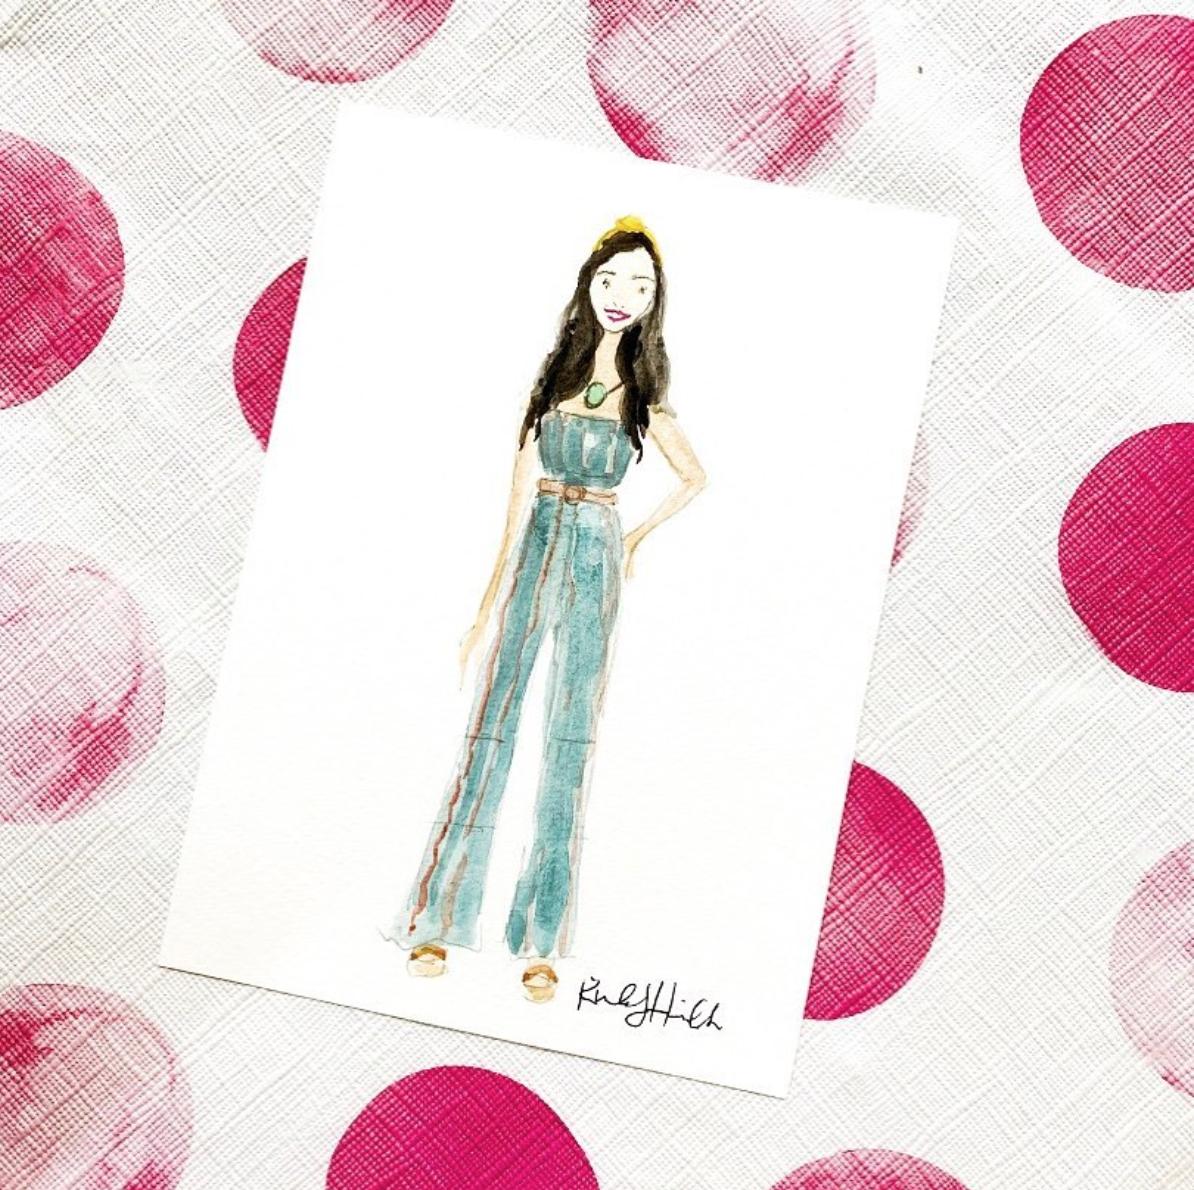 live-fashion-illustration-by-ladyfolk-studio